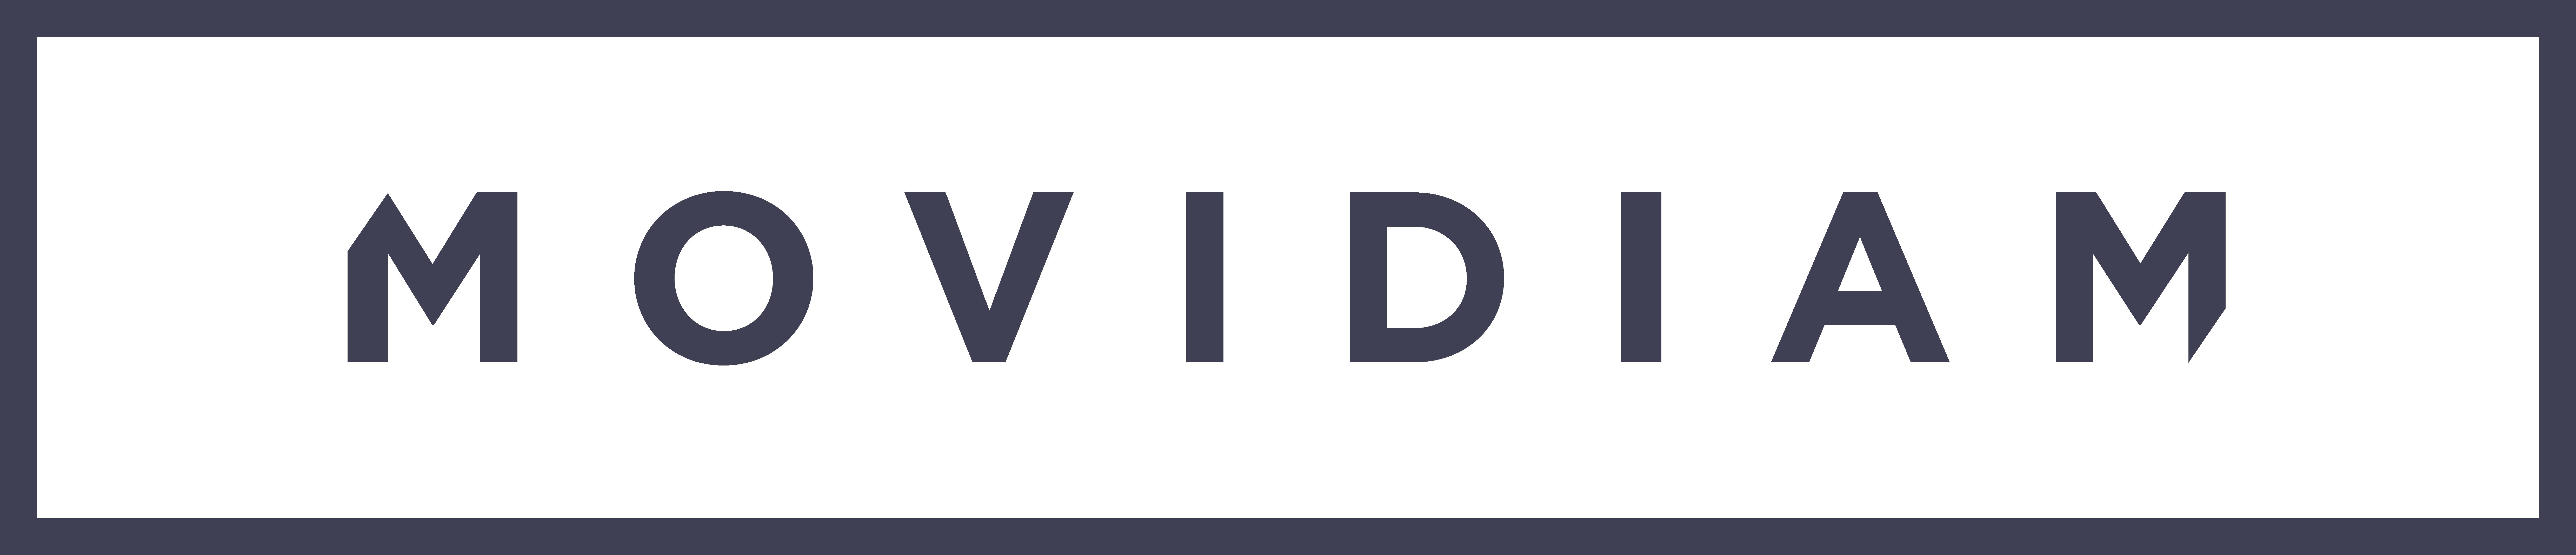 Movidiam Logo